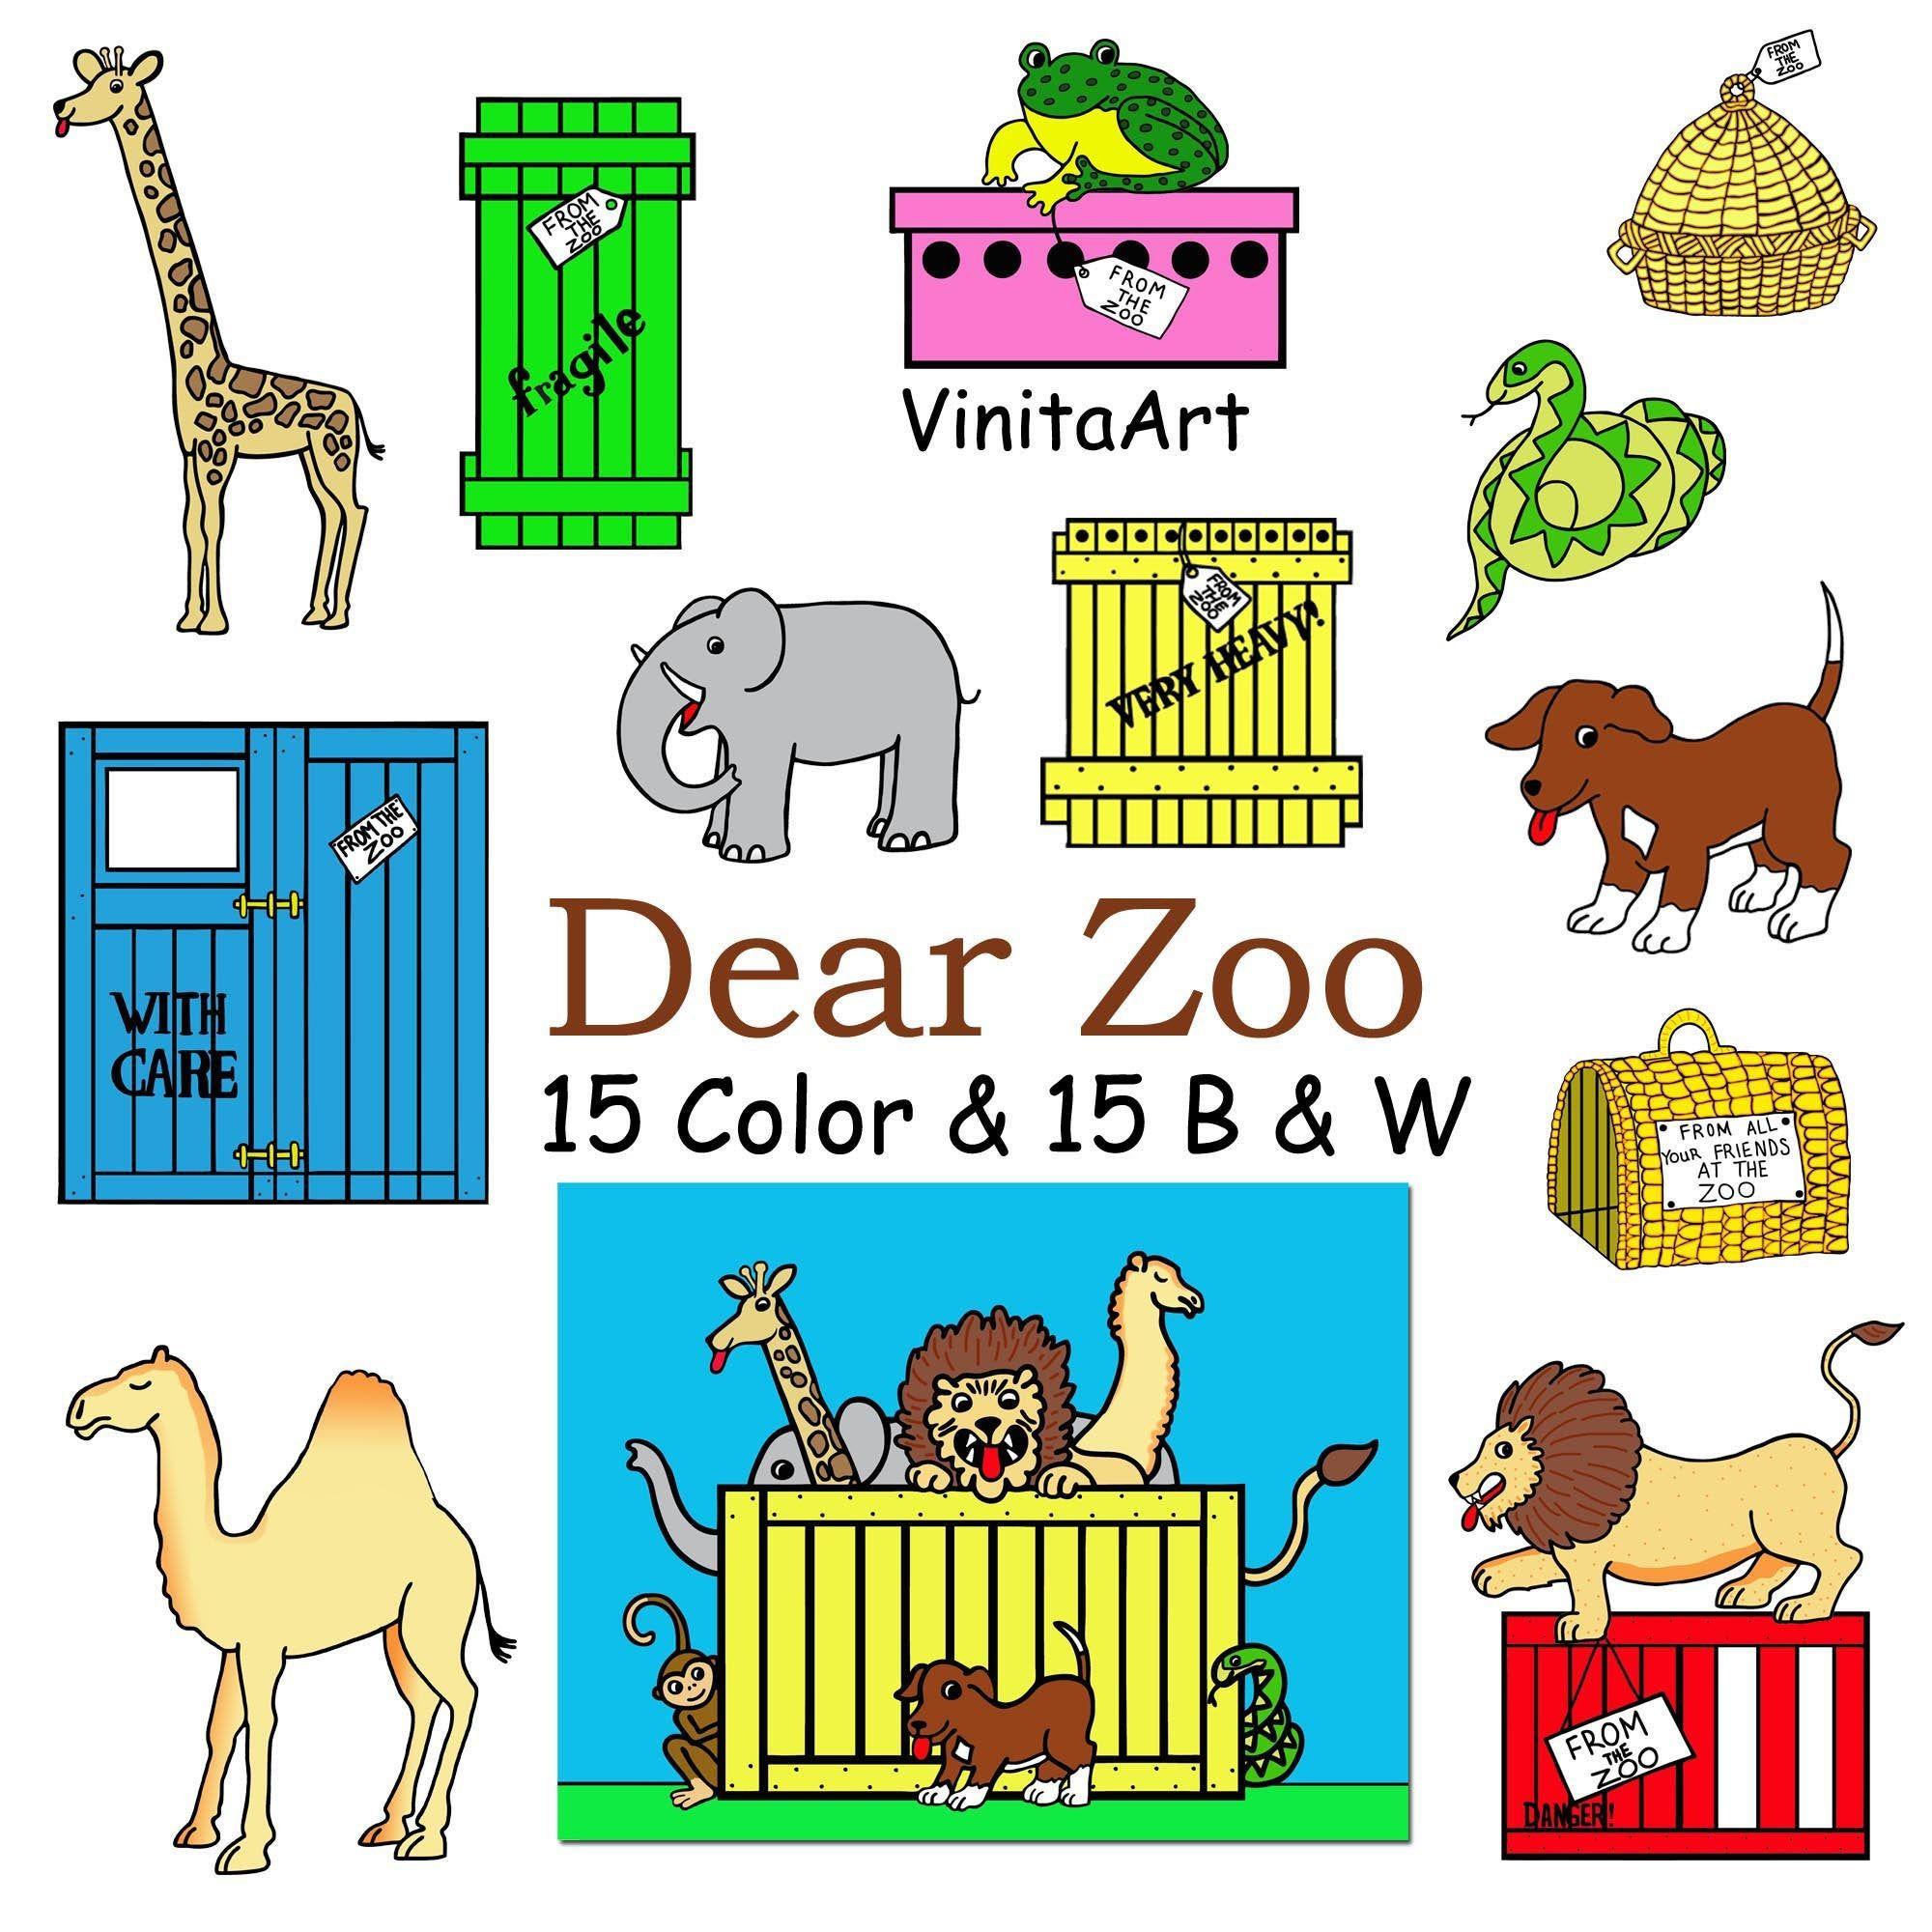 Dear Zoo Book Pdf Free Download